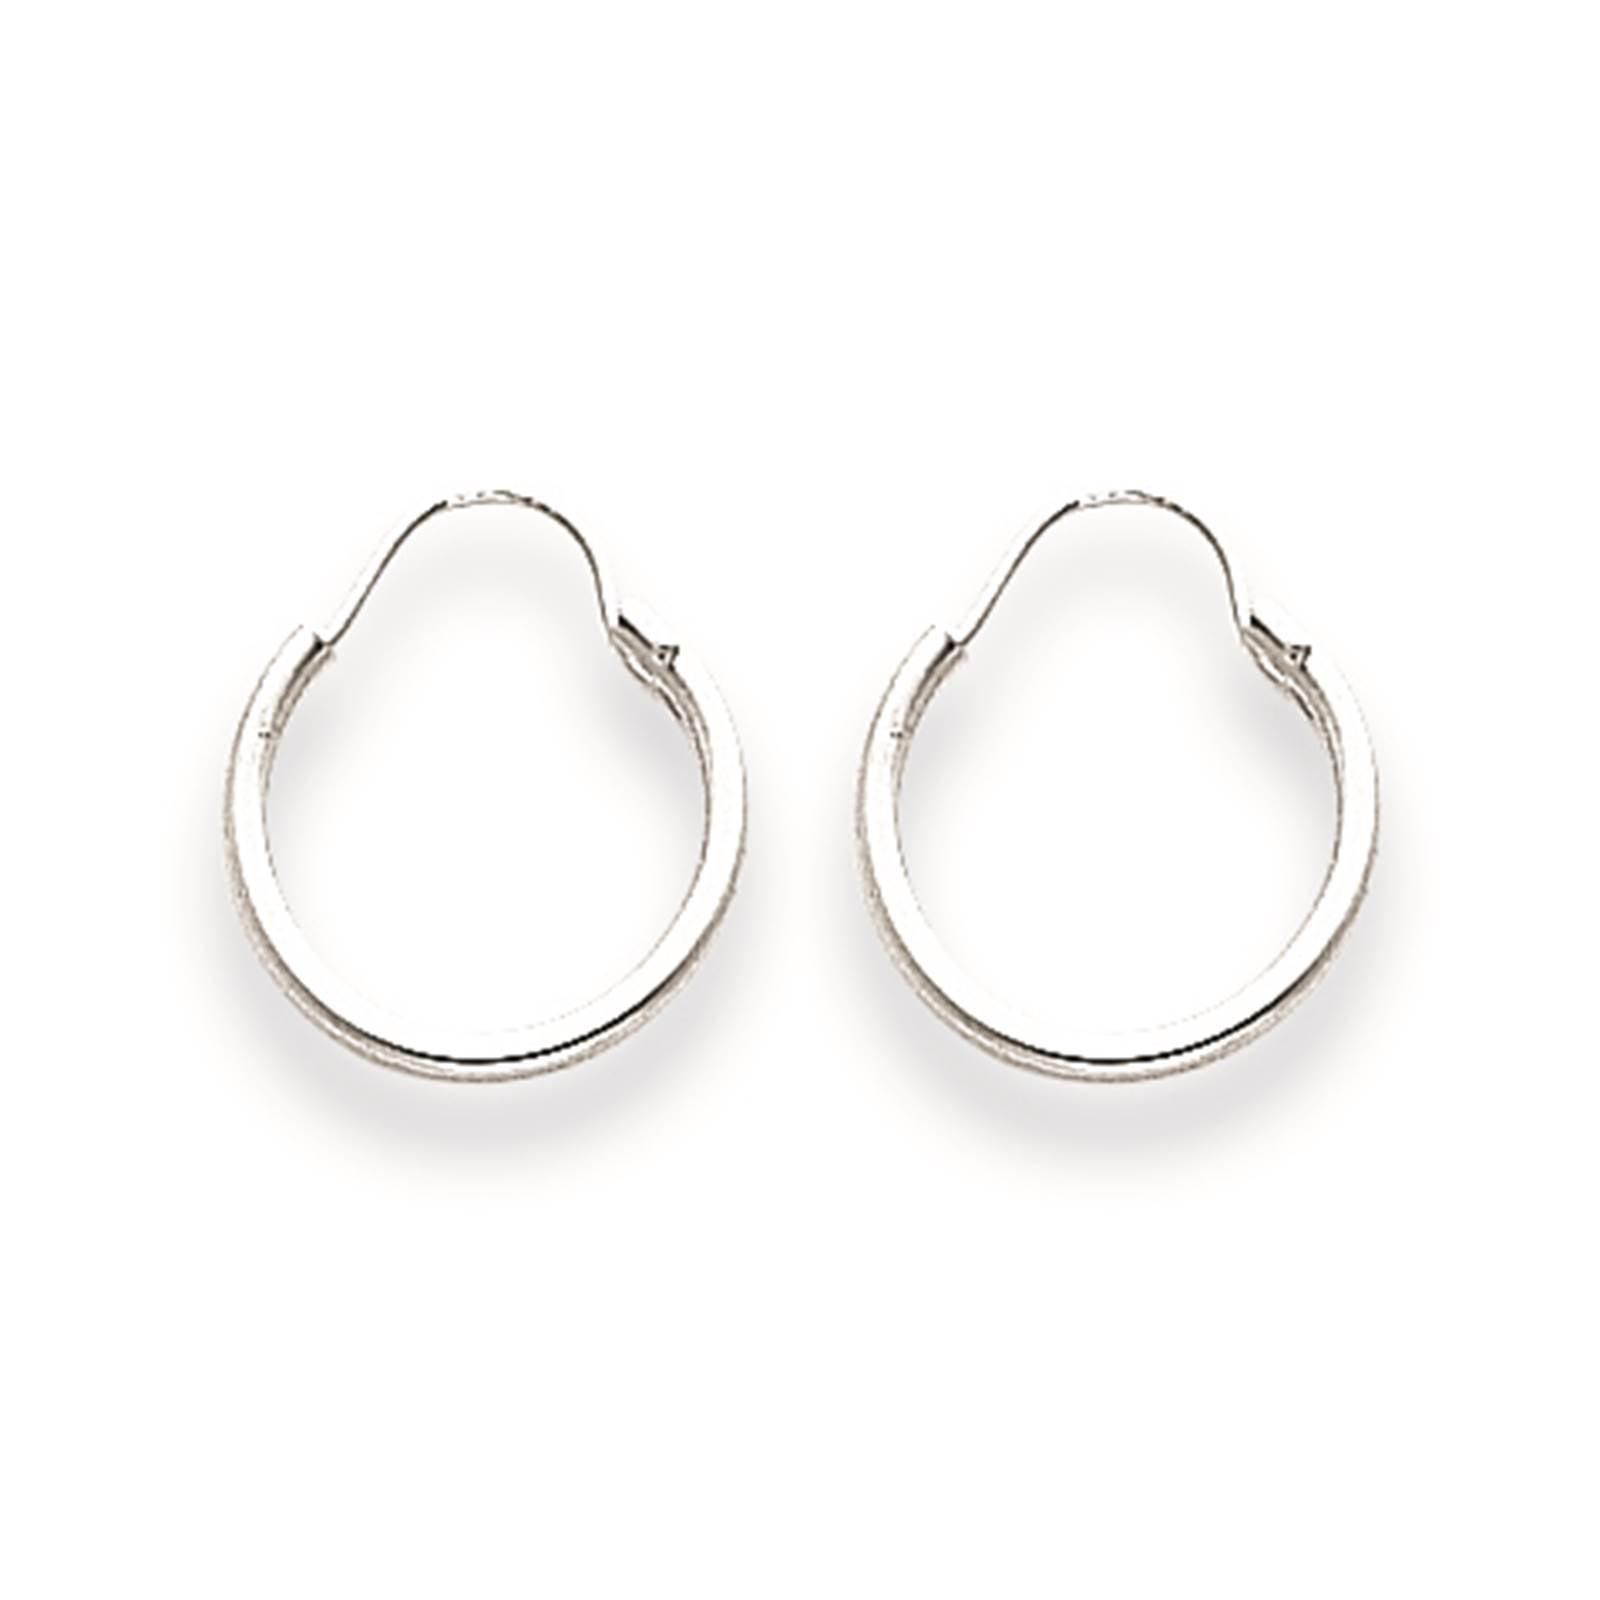 Madi K Childrens 14k White Gold Hollow & Polished 1.25mm Endless Hoop Earrings